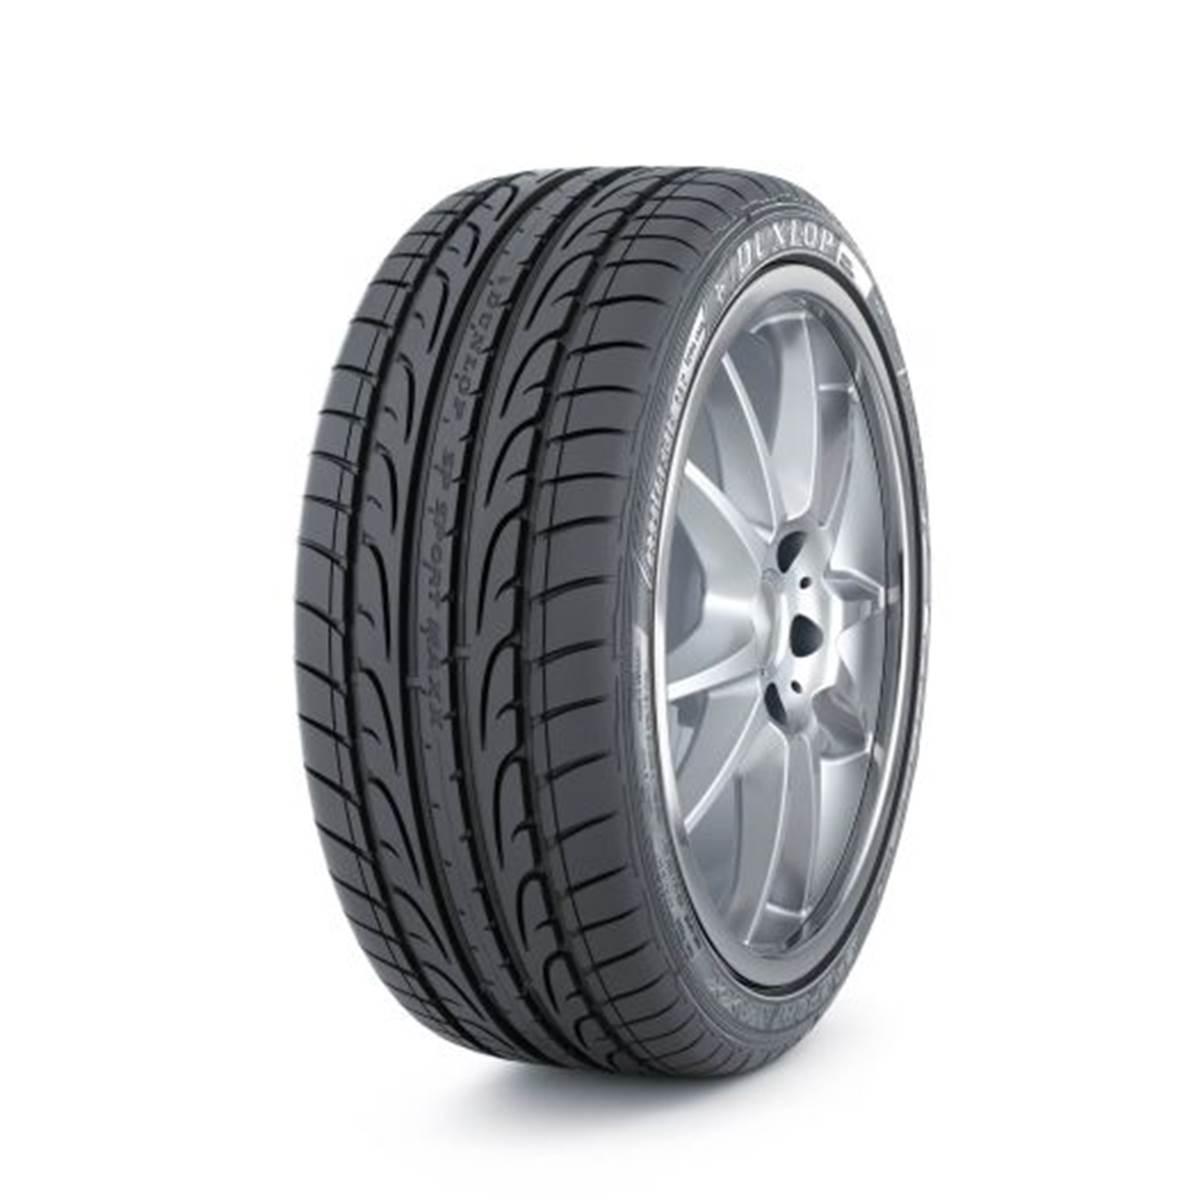 Pneu 4X4 DUNLOP 325/30R21 108Y Sp Sport Maxx XL